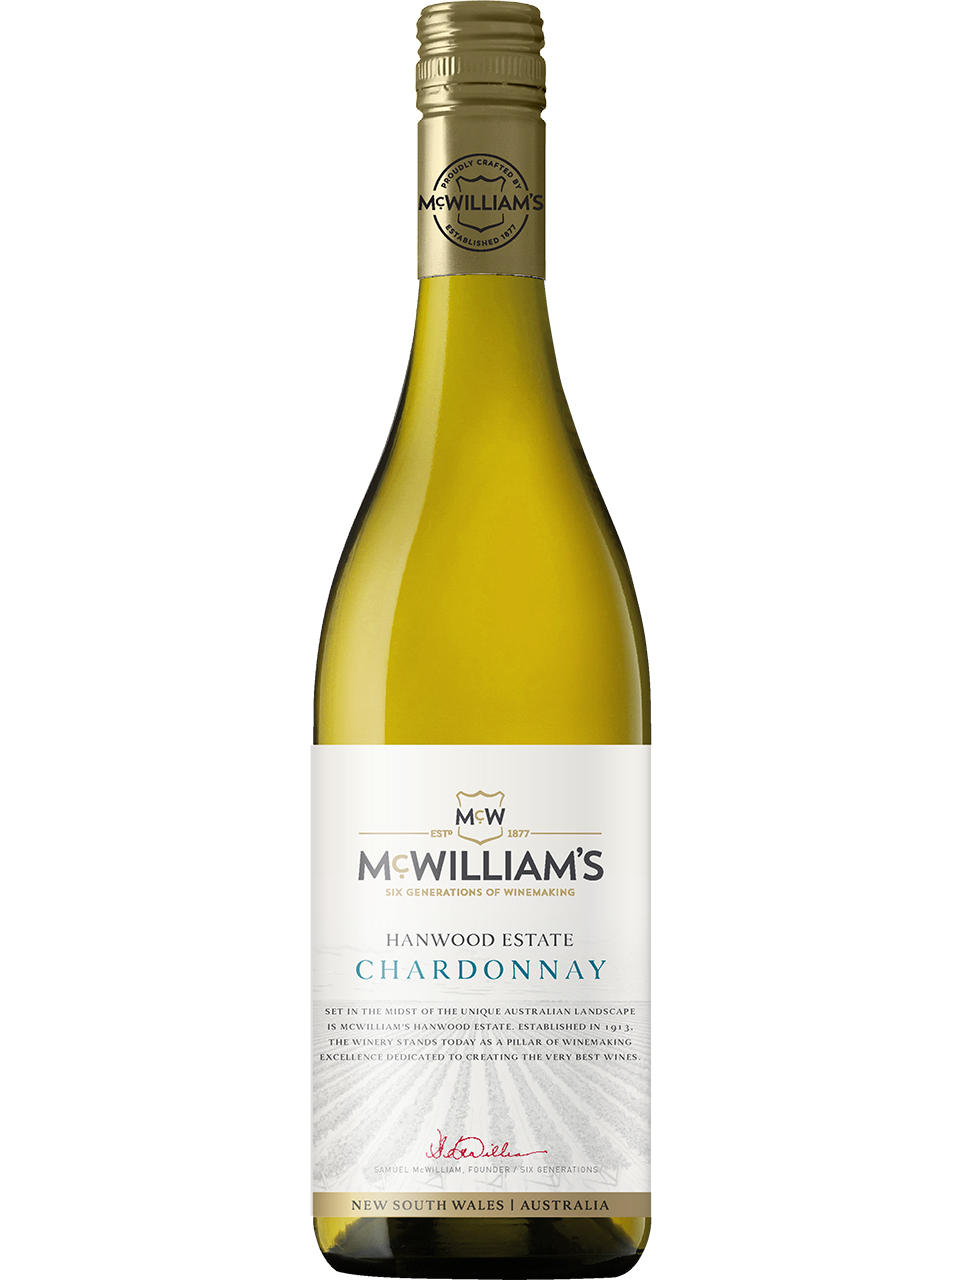 McWilliam's Hanwood Estate Chardonnay